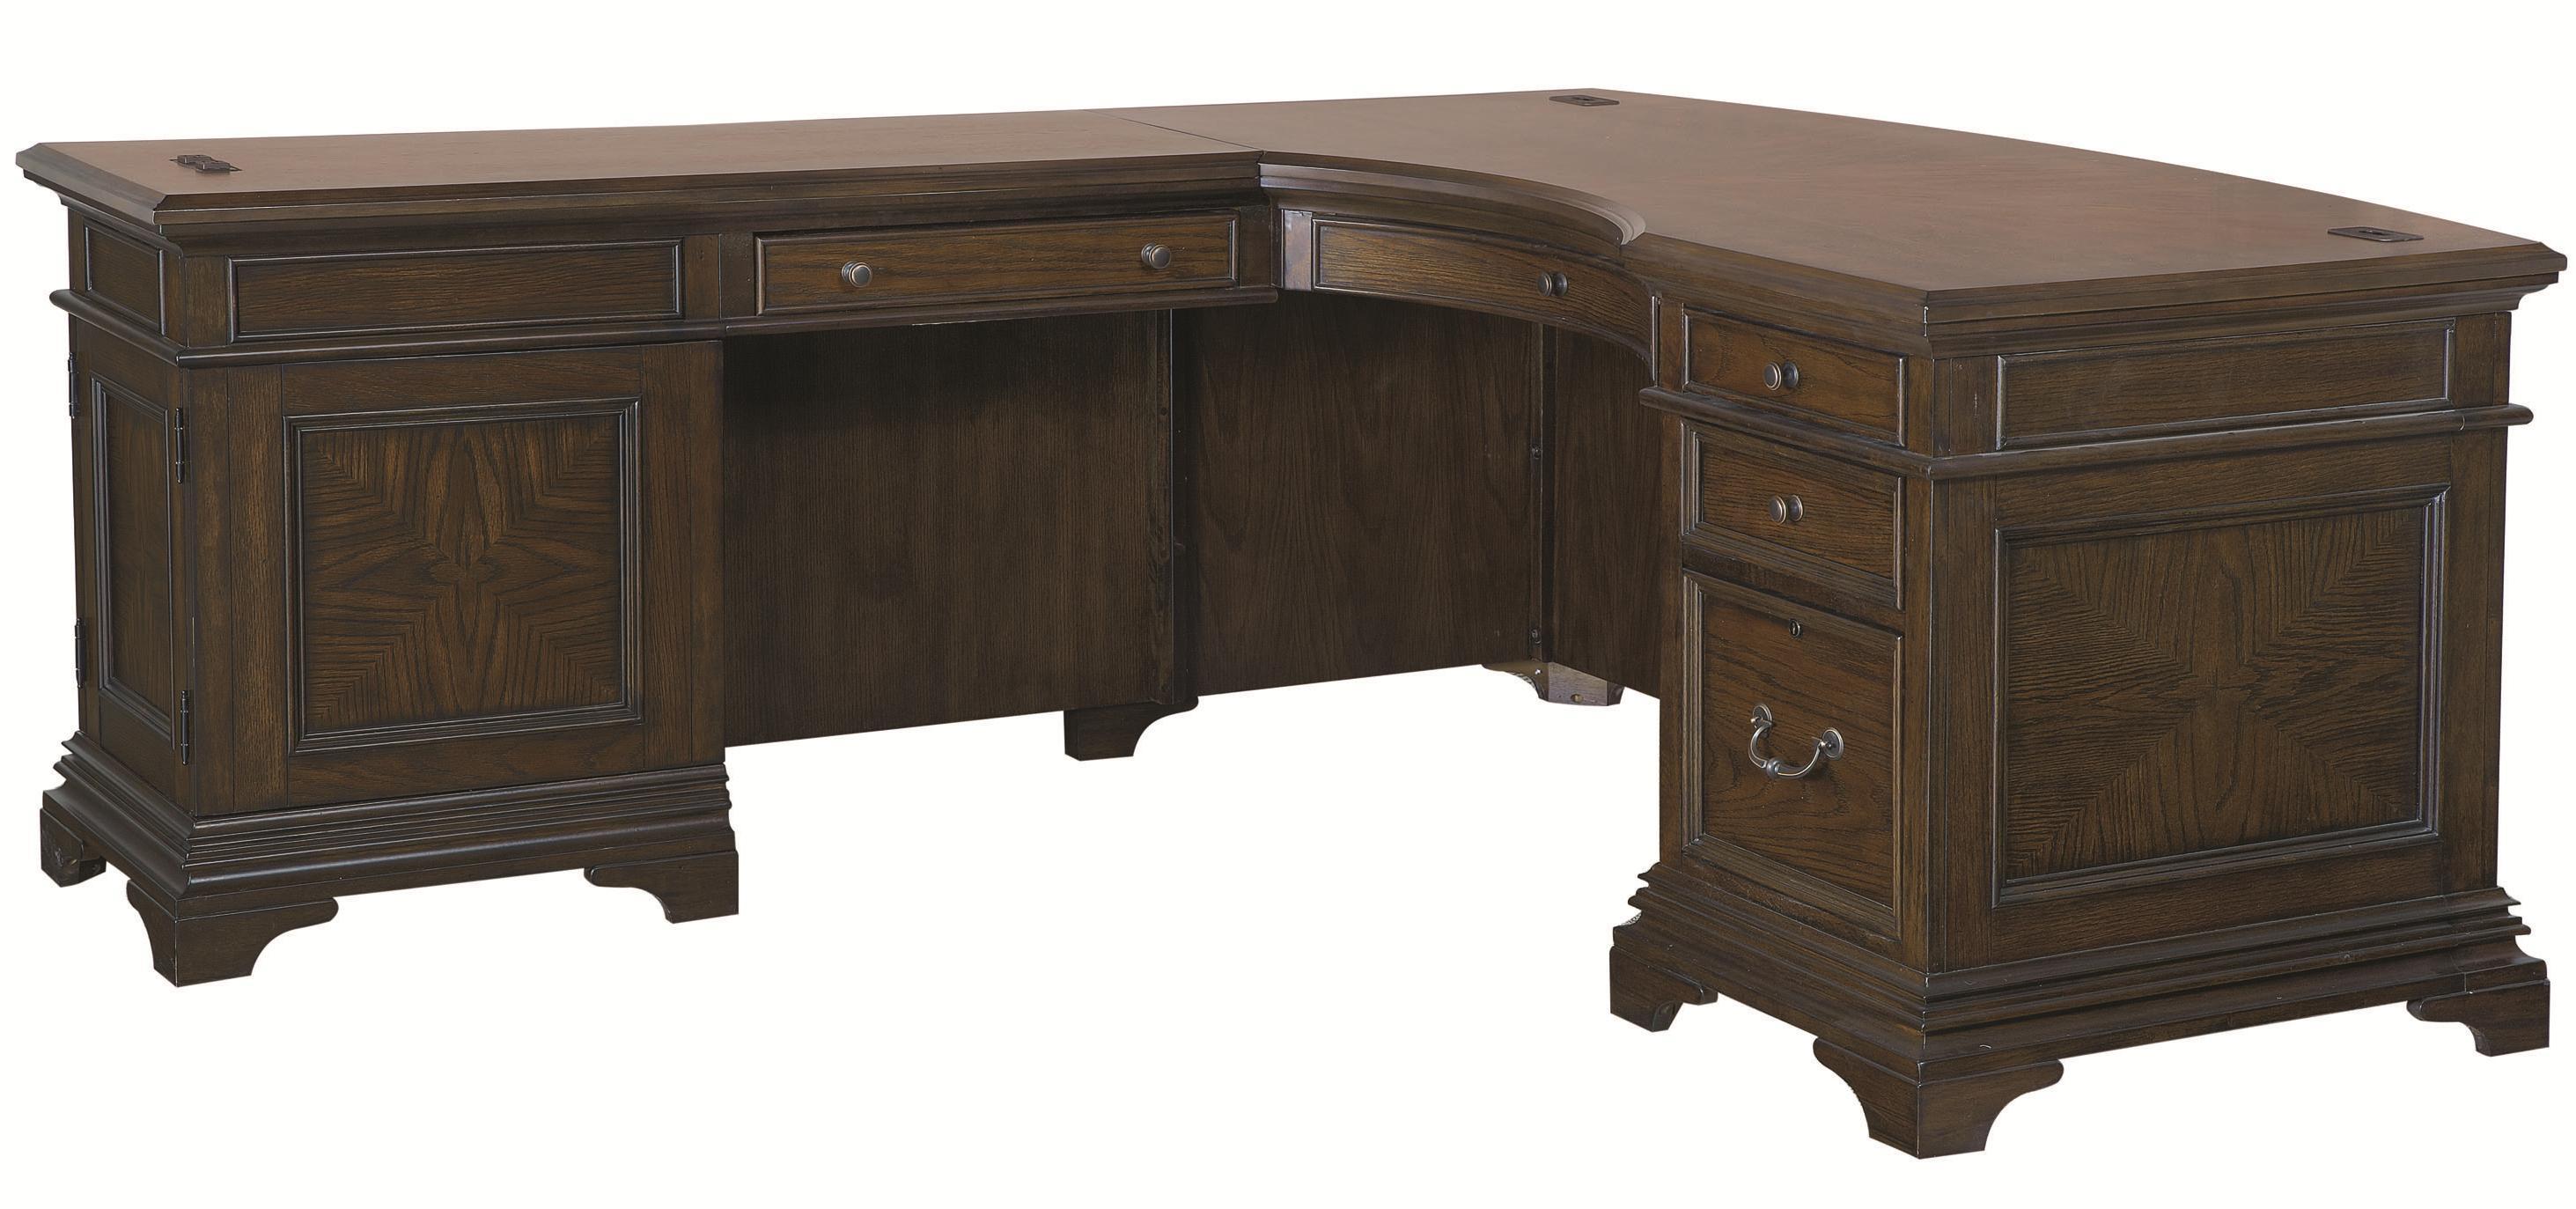 Essex Desk and Reversible Return by Aspenhome at Walker's Furniture